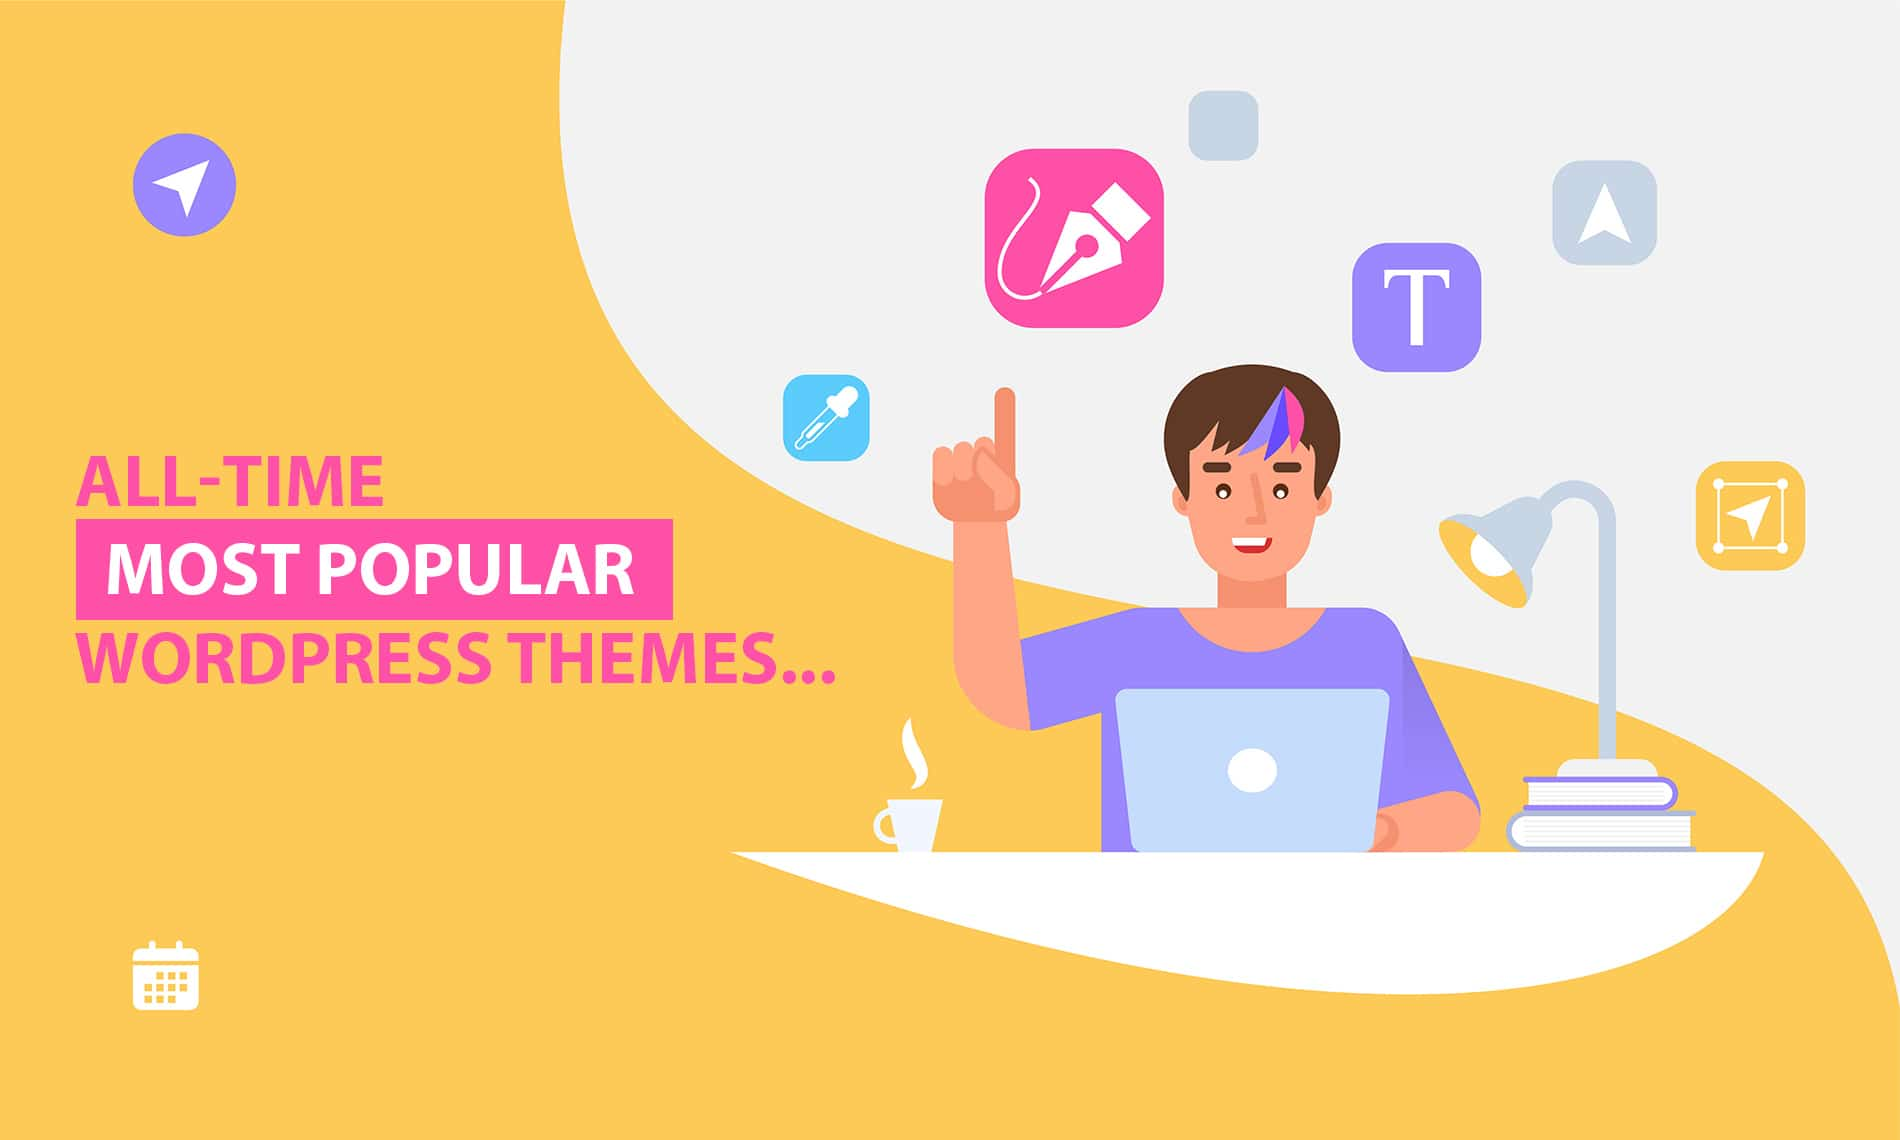 All-time Most Popular WordPress Premium Themes